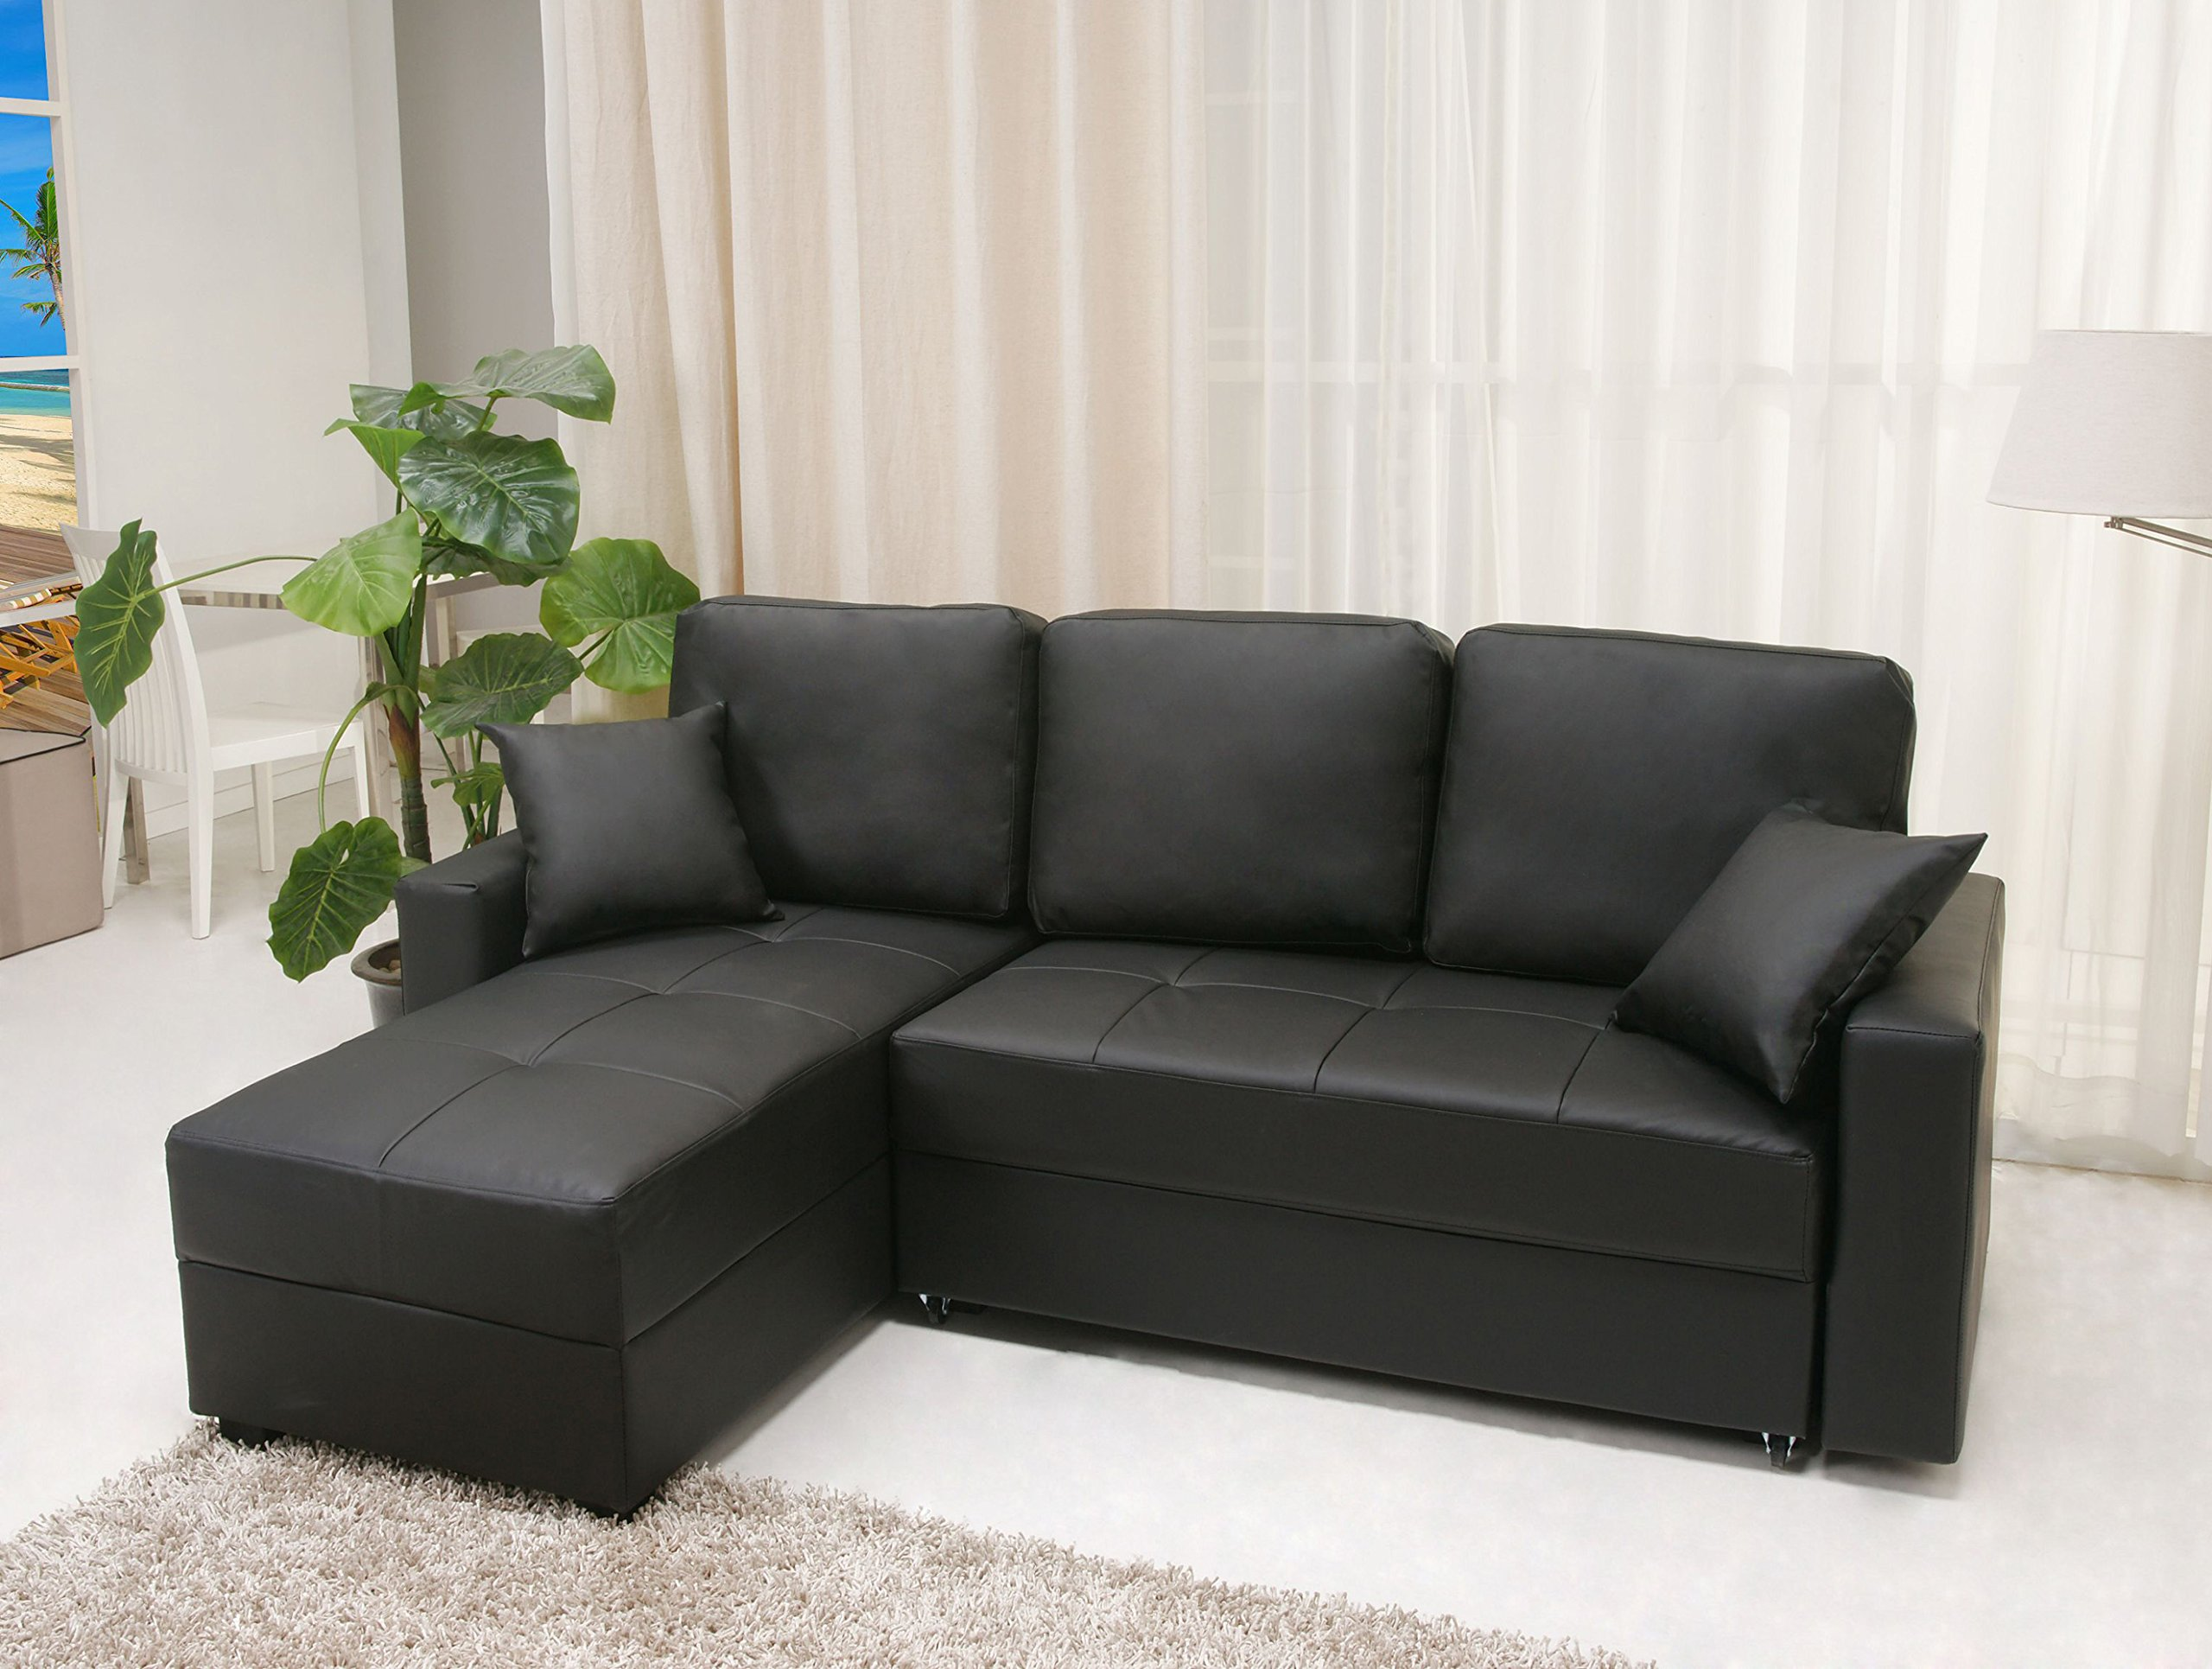 Most Comfortable Sofa Sleeper